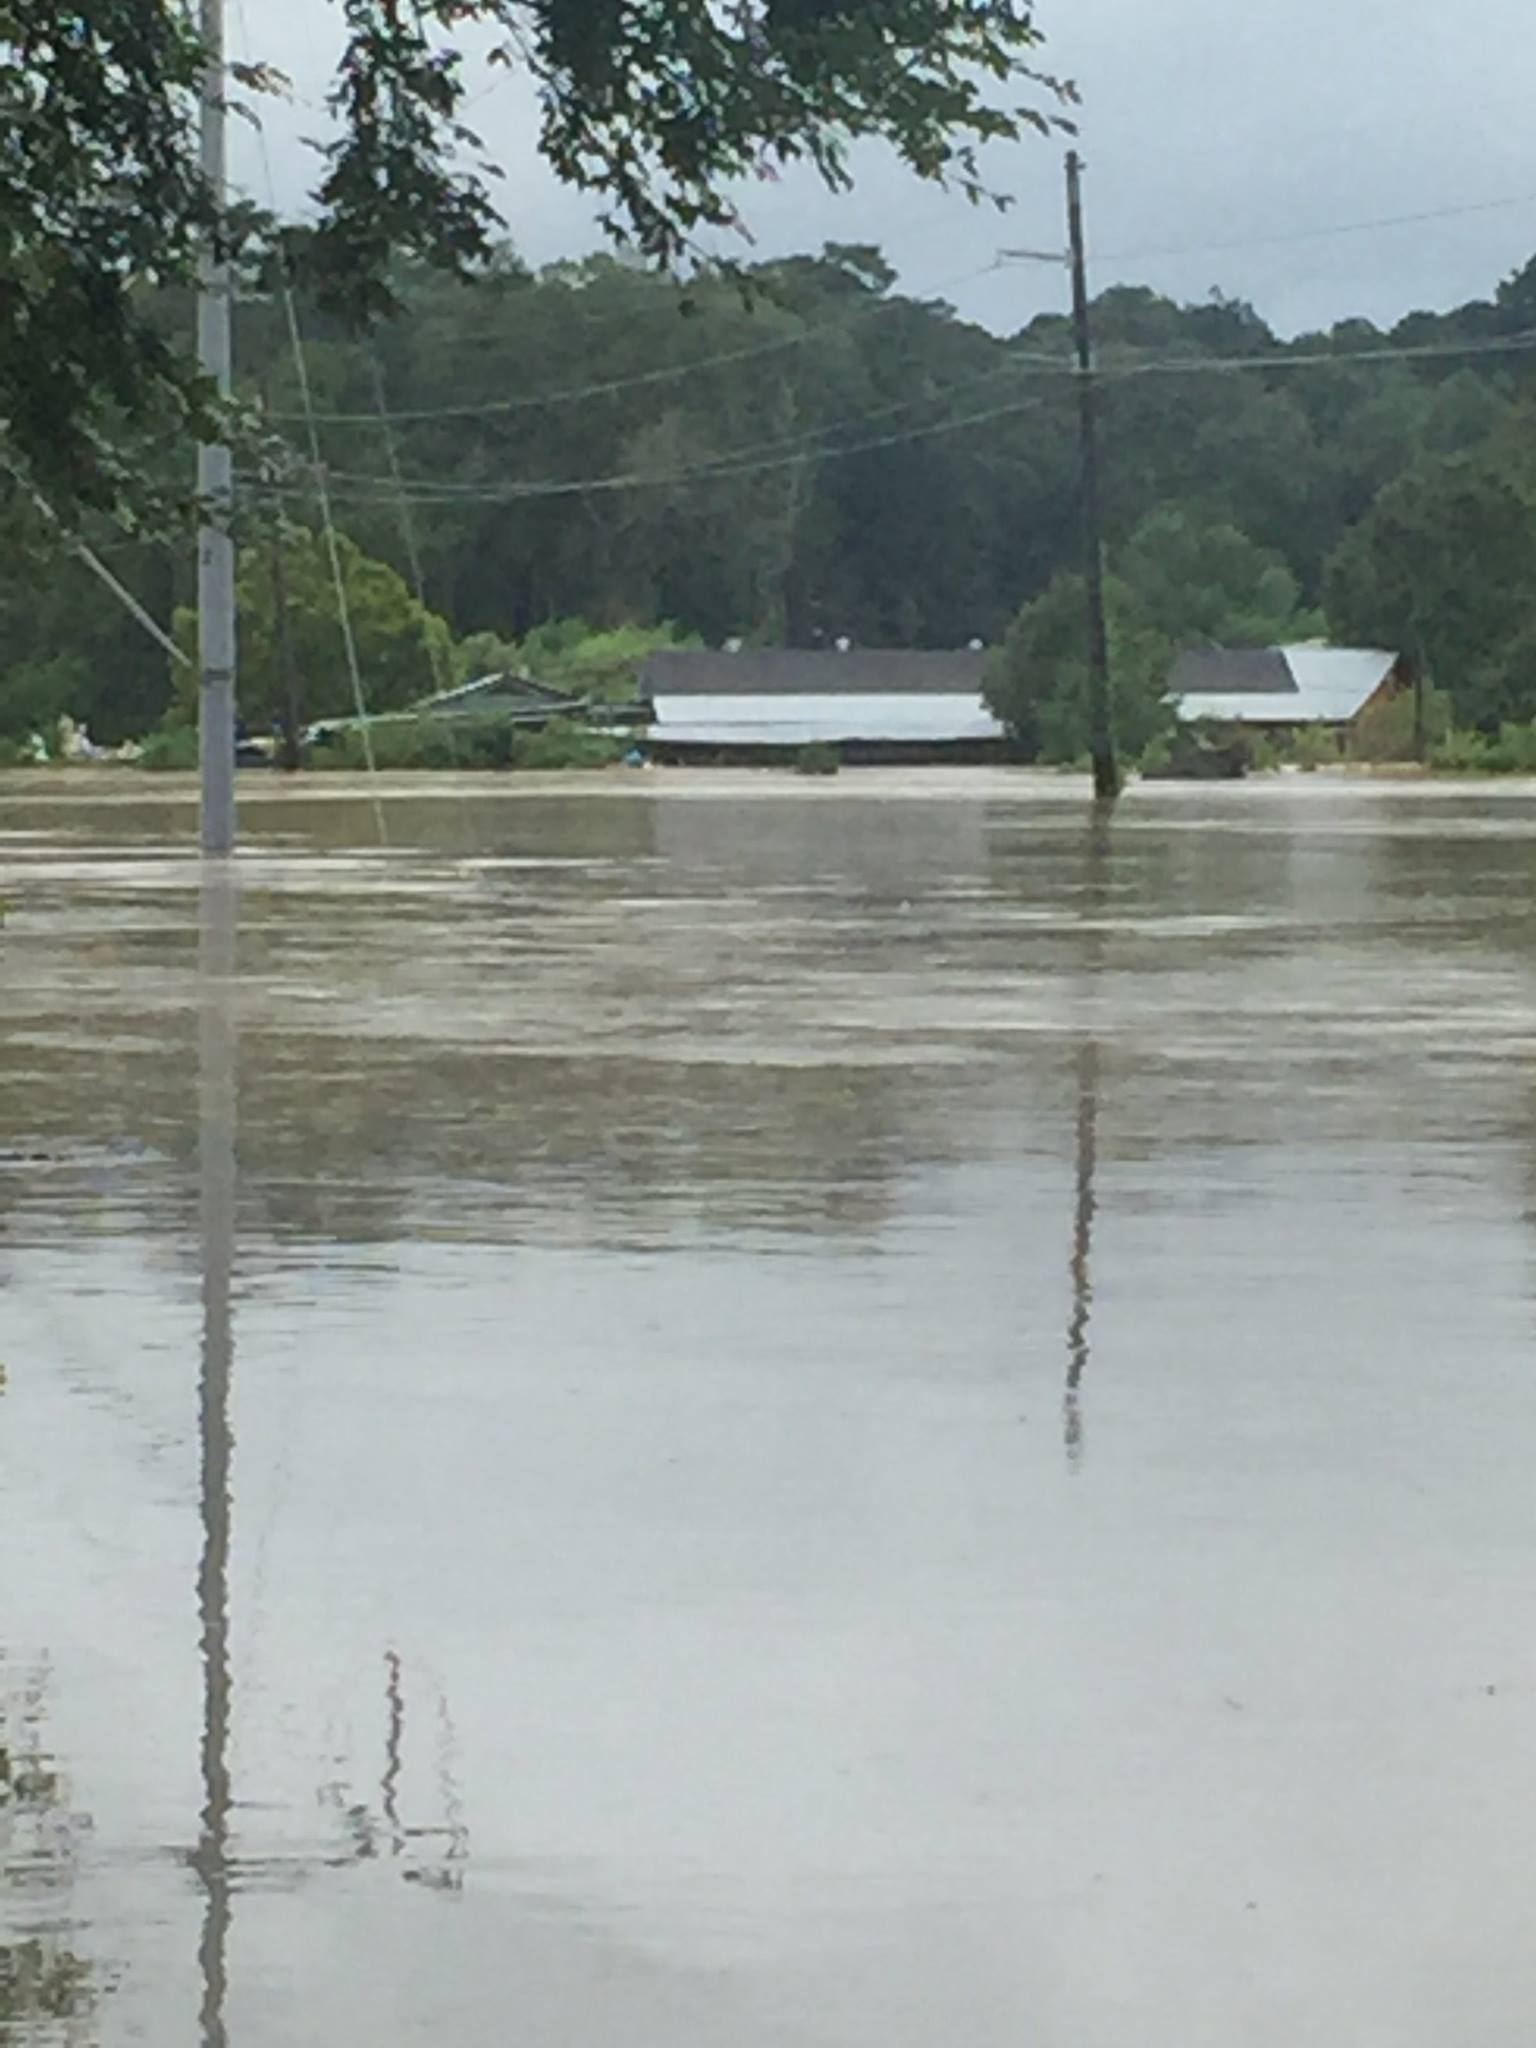 Louisiana Flood Update 13923800_1070483416369118_6642827762316043409_o